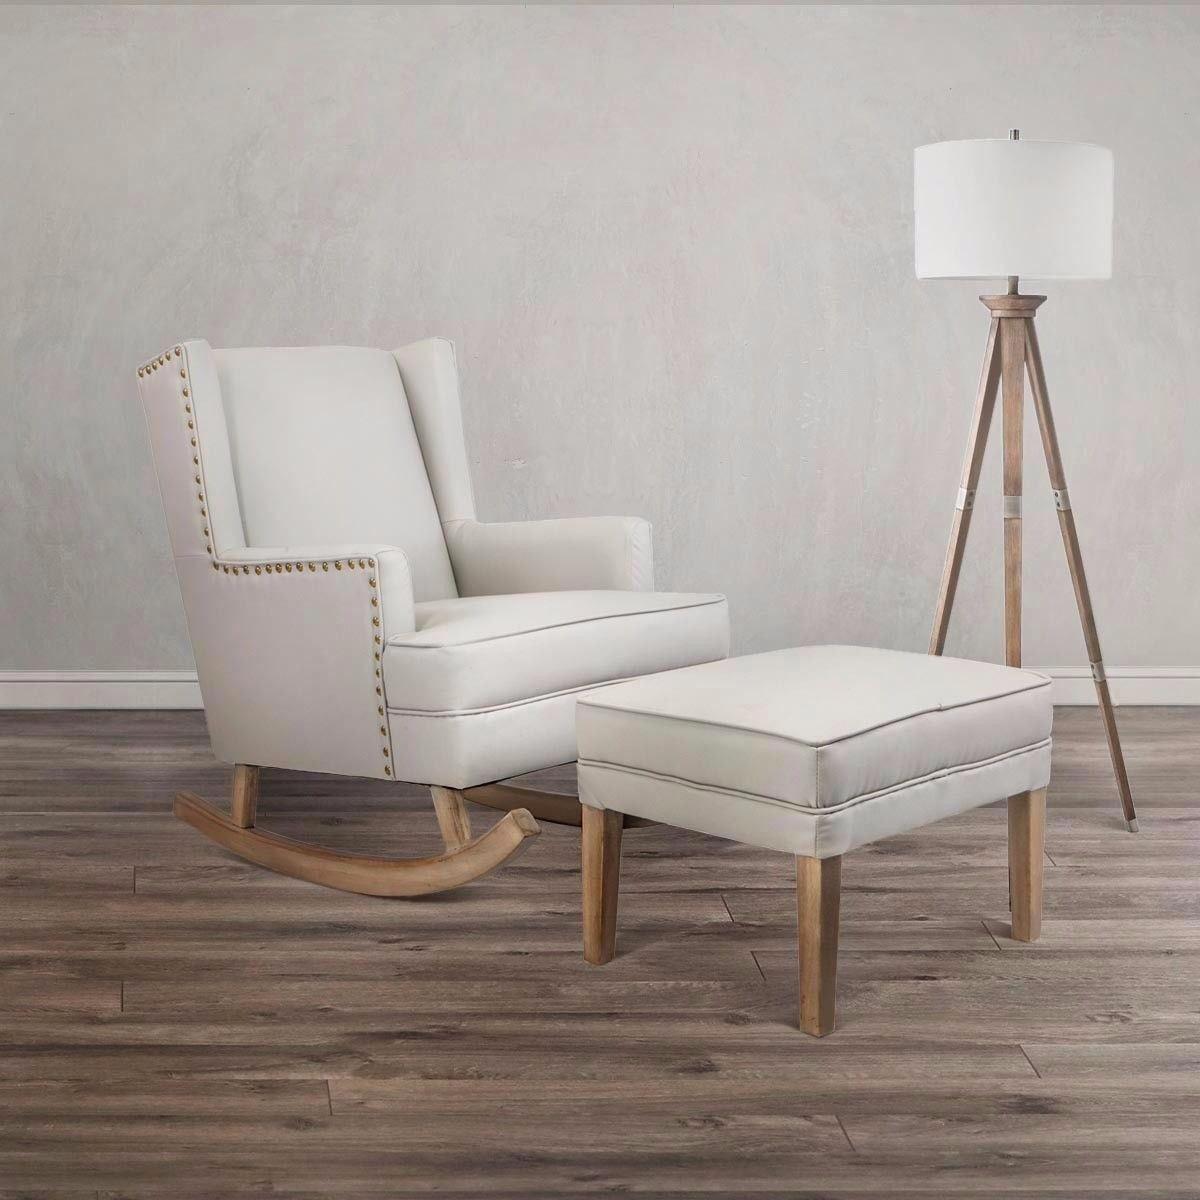 Admirable Baby Nursery Leather Rocker Rocking Chair Glider Ottoman Short Links Chair Design For Home Short Linksinfo